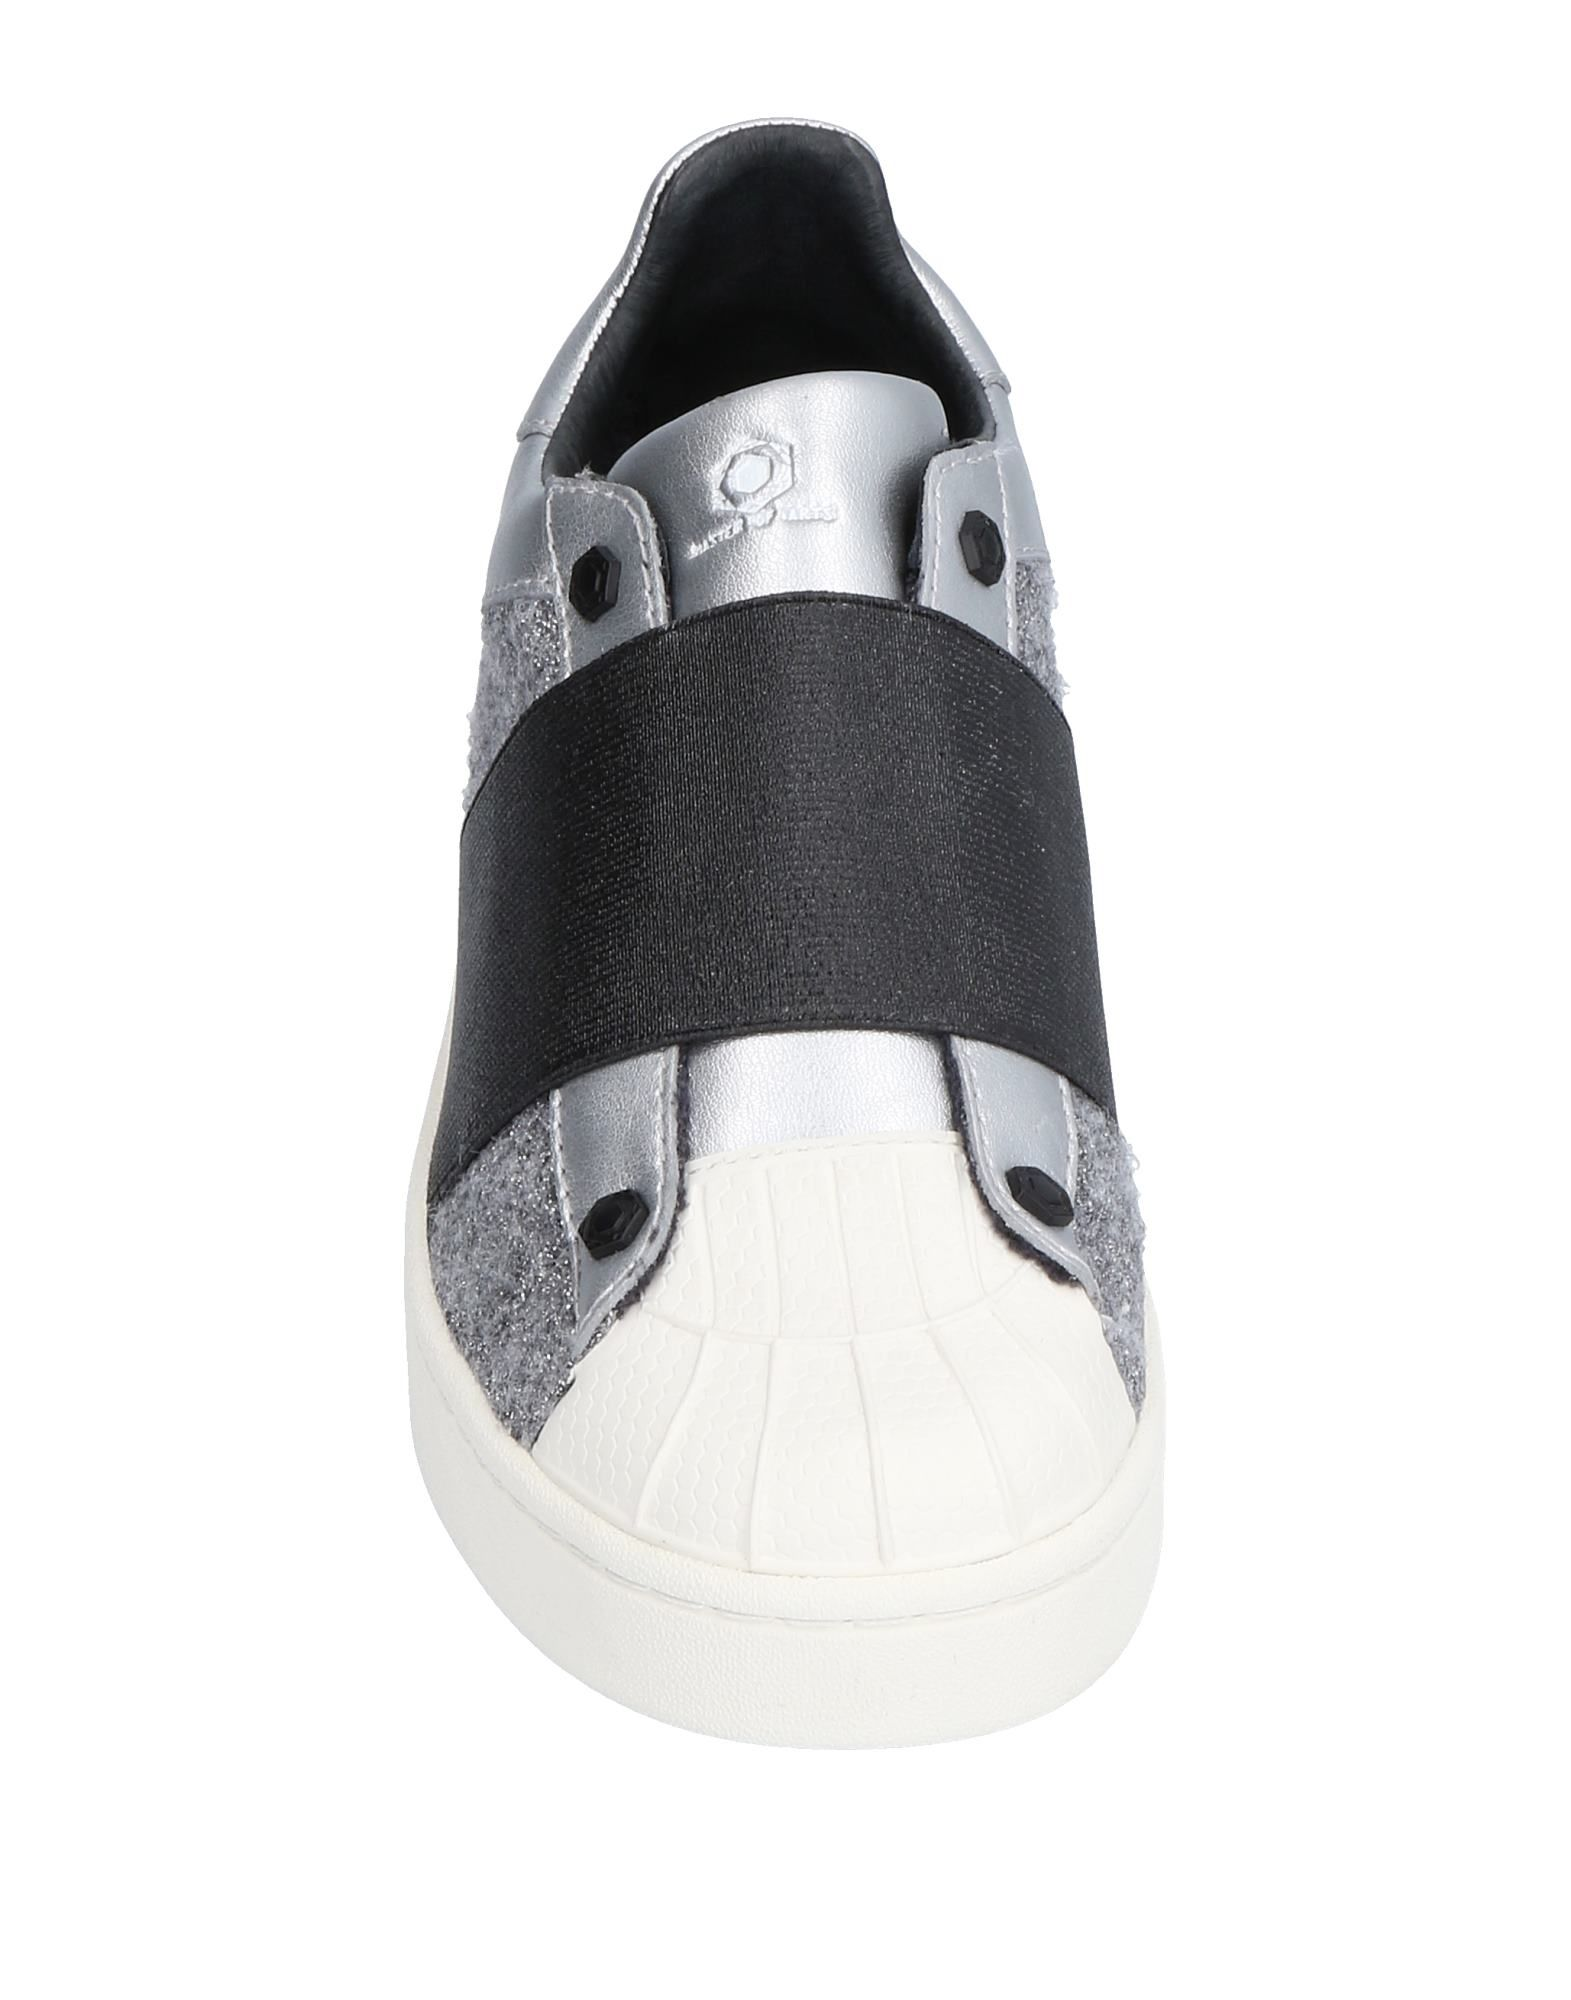 59e3e2d8b4 ... Stilvolle billige Arts Schuhe Moa Master Of Arts billige Sneakers Damen  11509607OE f27739 ...